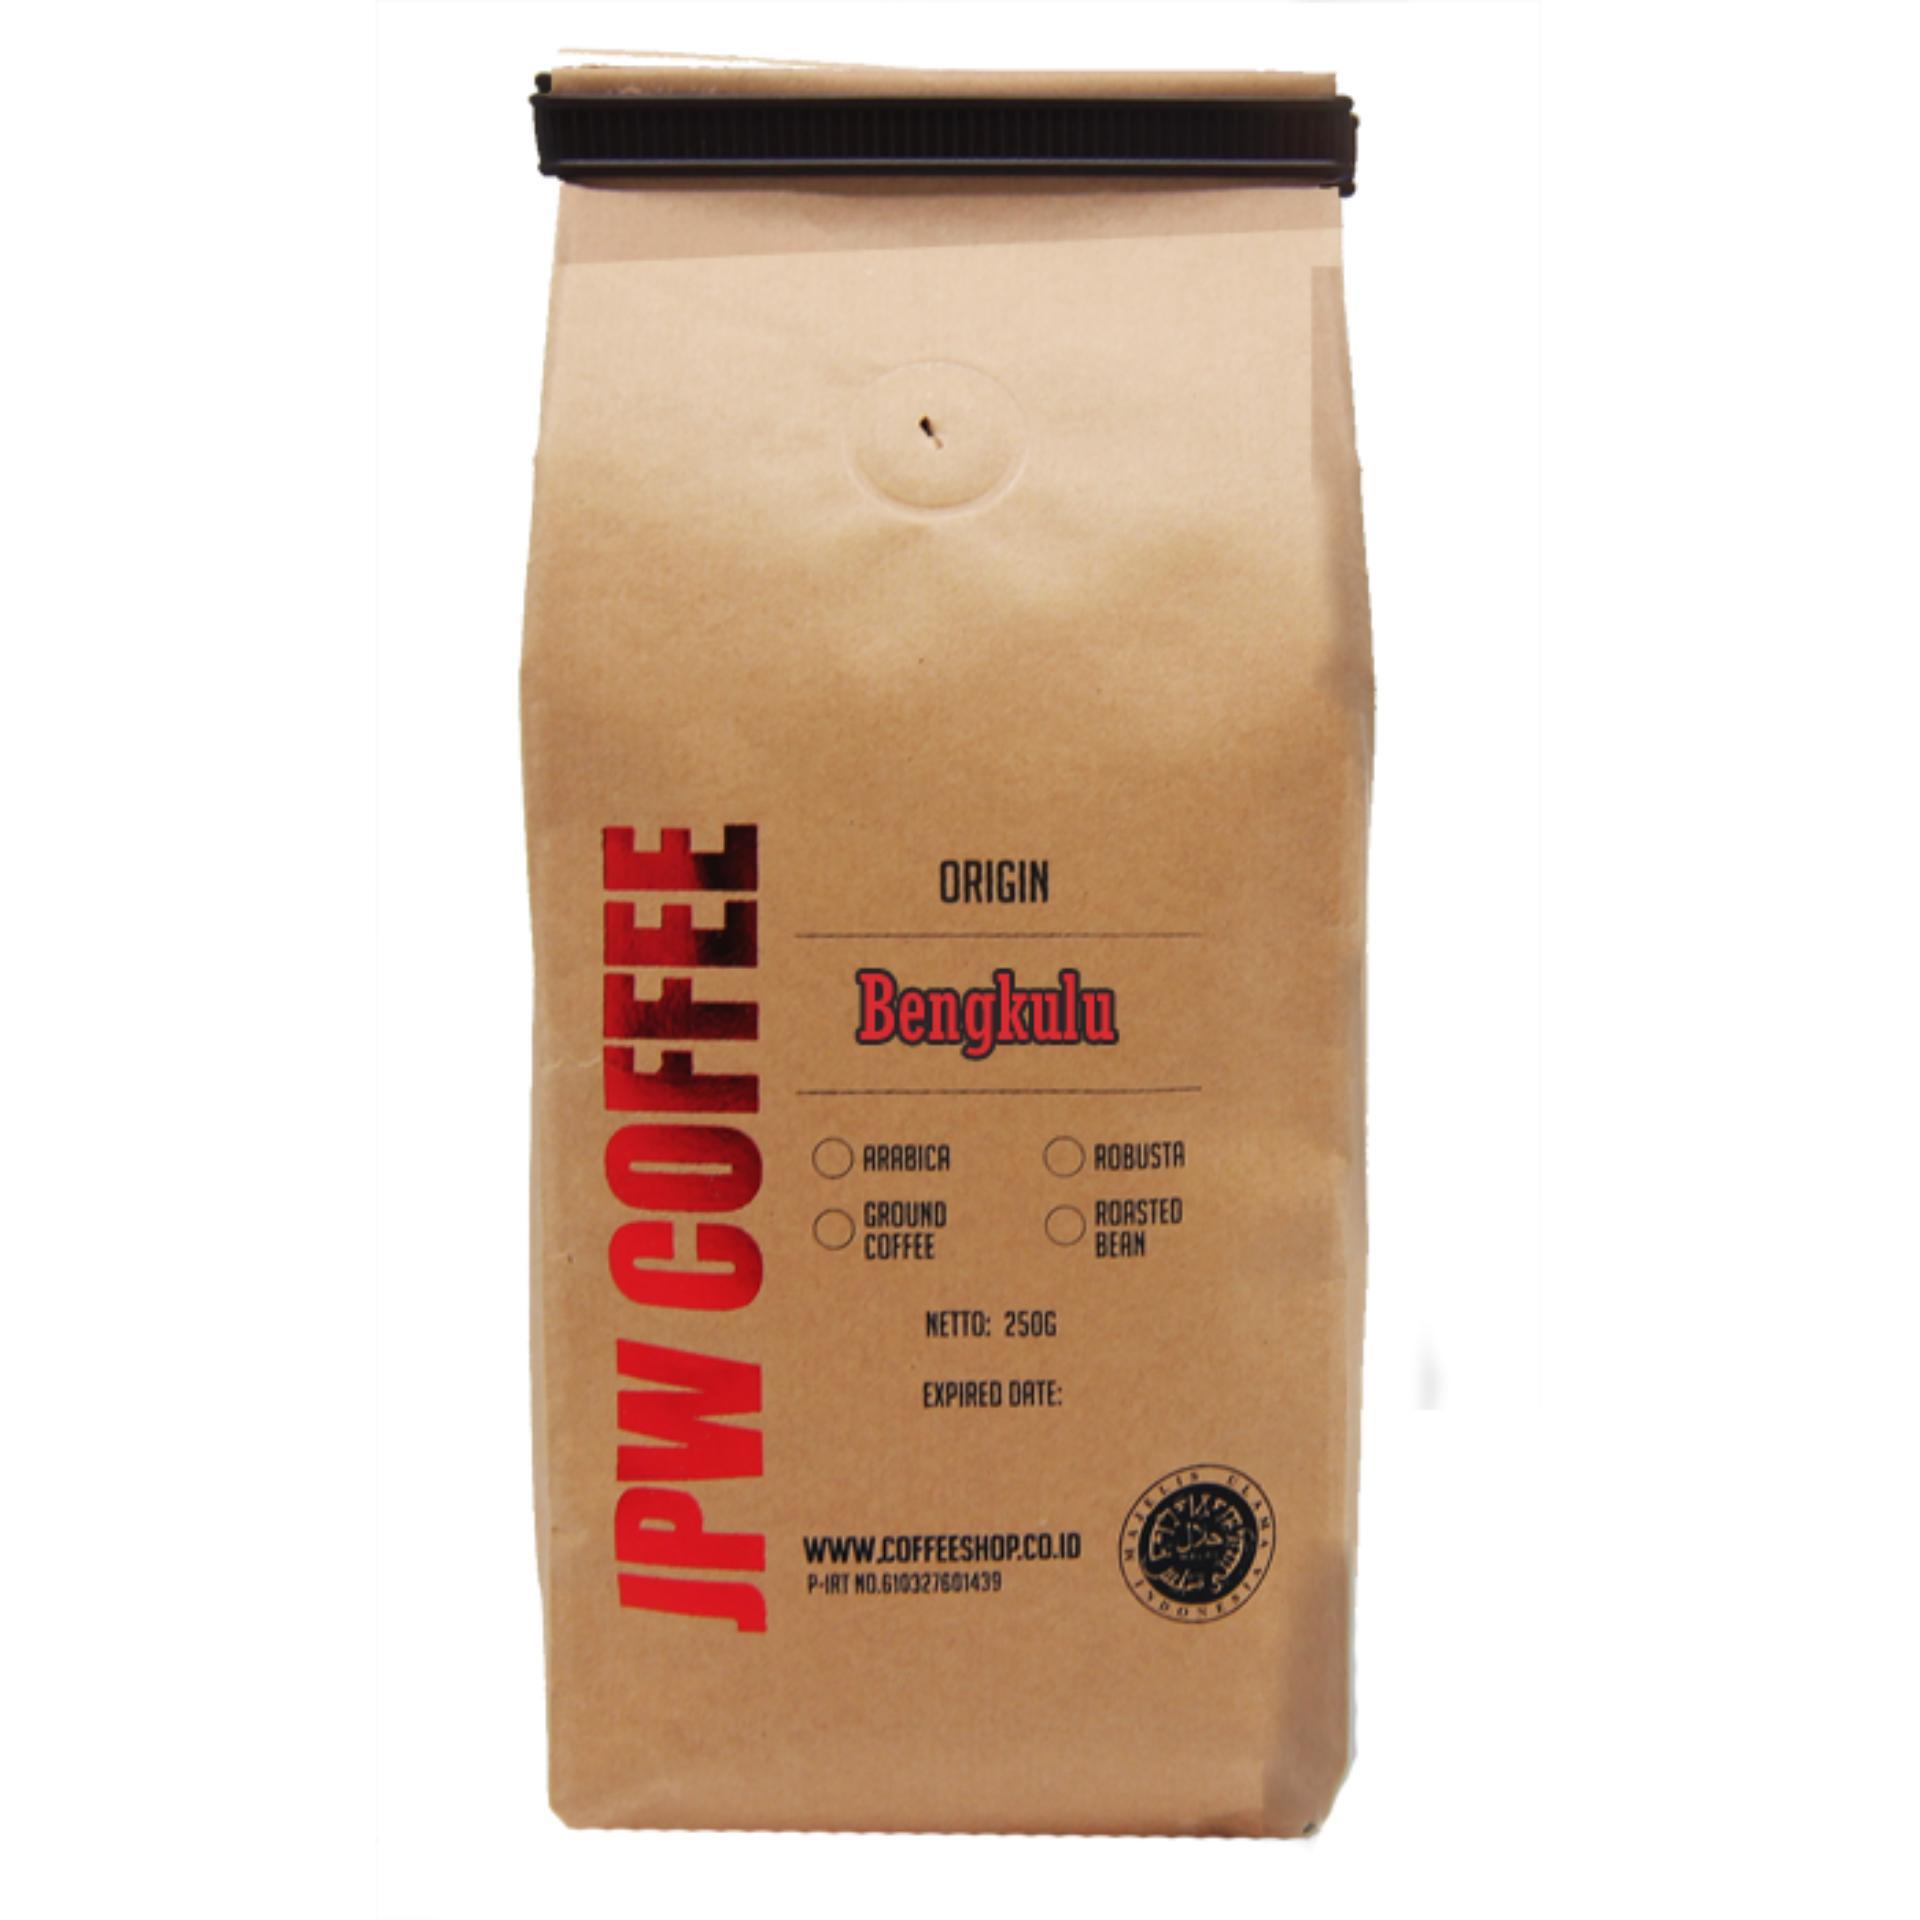 JPW Coffee Kopi Bengkulu 250g Bubuk - Specialty Grade Coffee